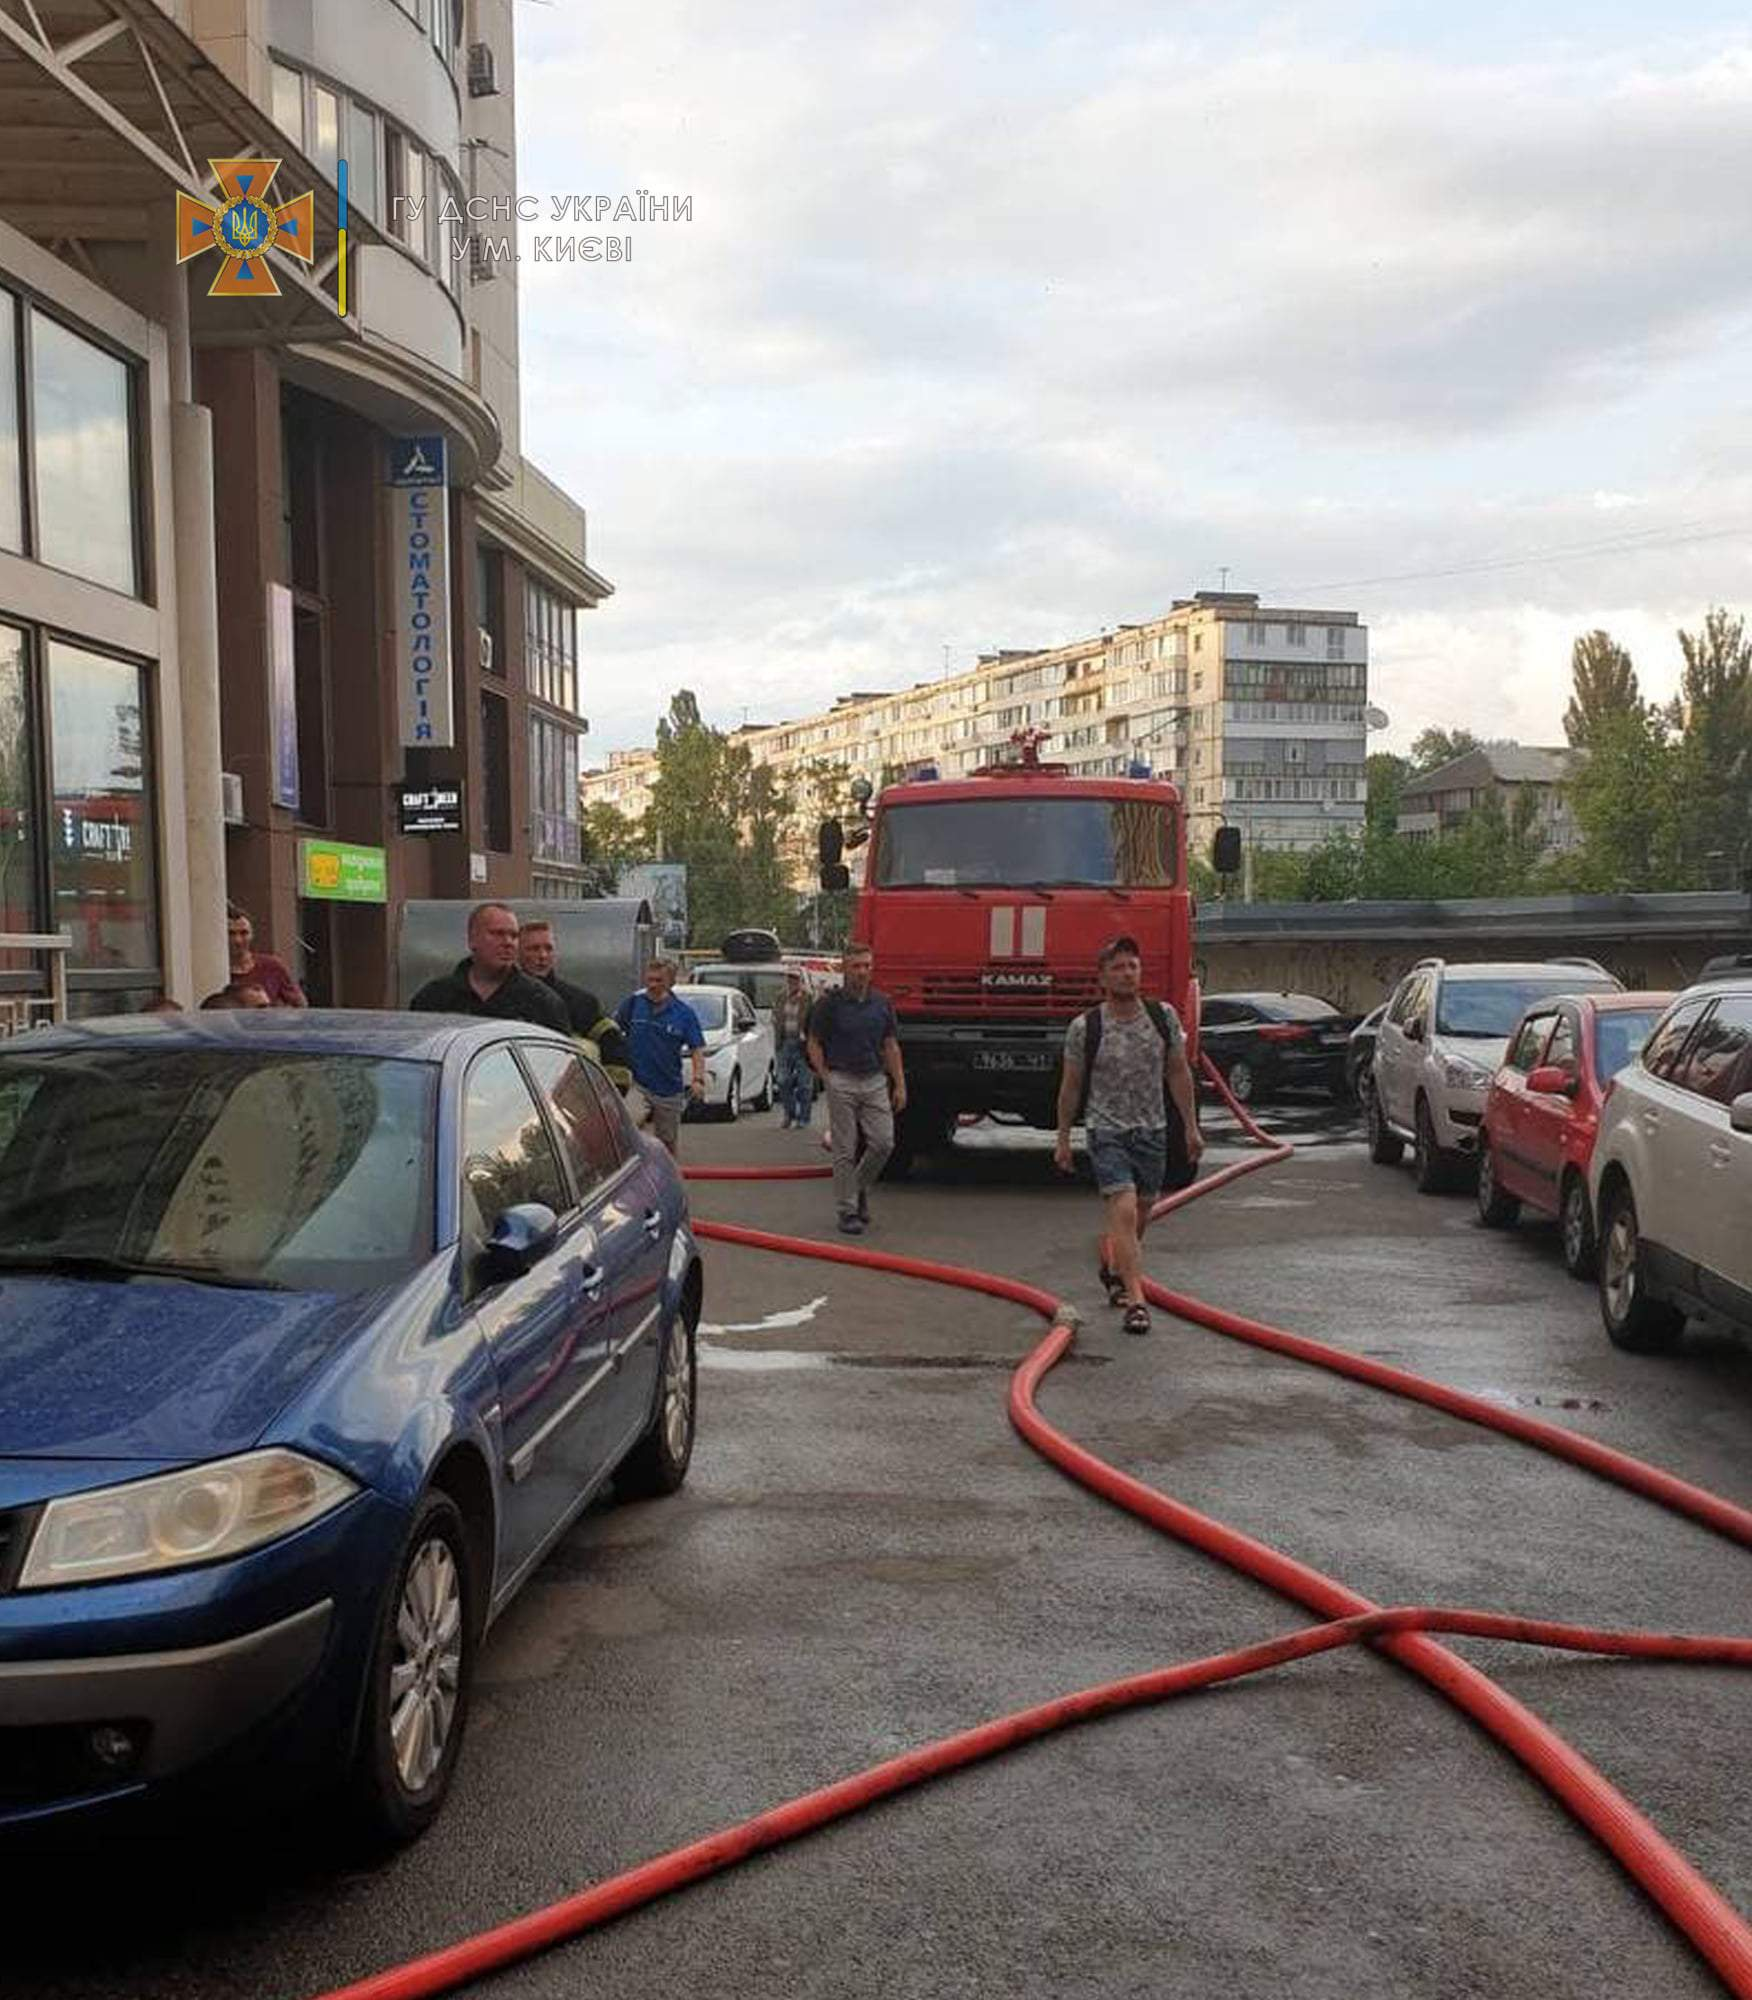 Пожежа супермаркету у Києві